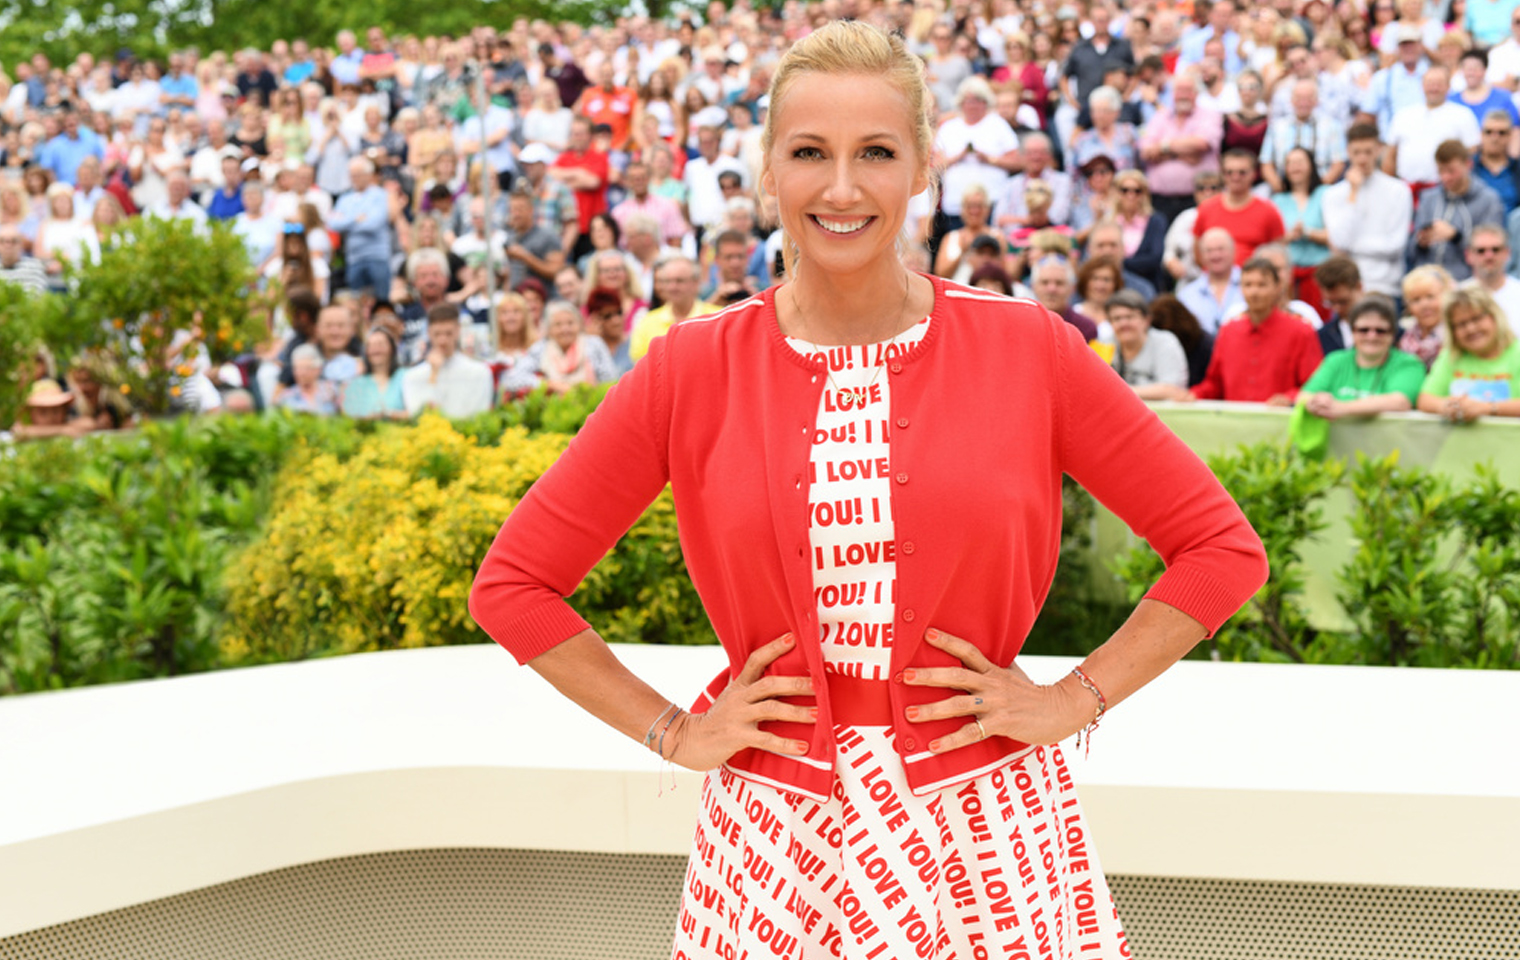 Skandal Im Zdf Fernsehgarten Aufstand Gegen Andrea Kiewel Promis